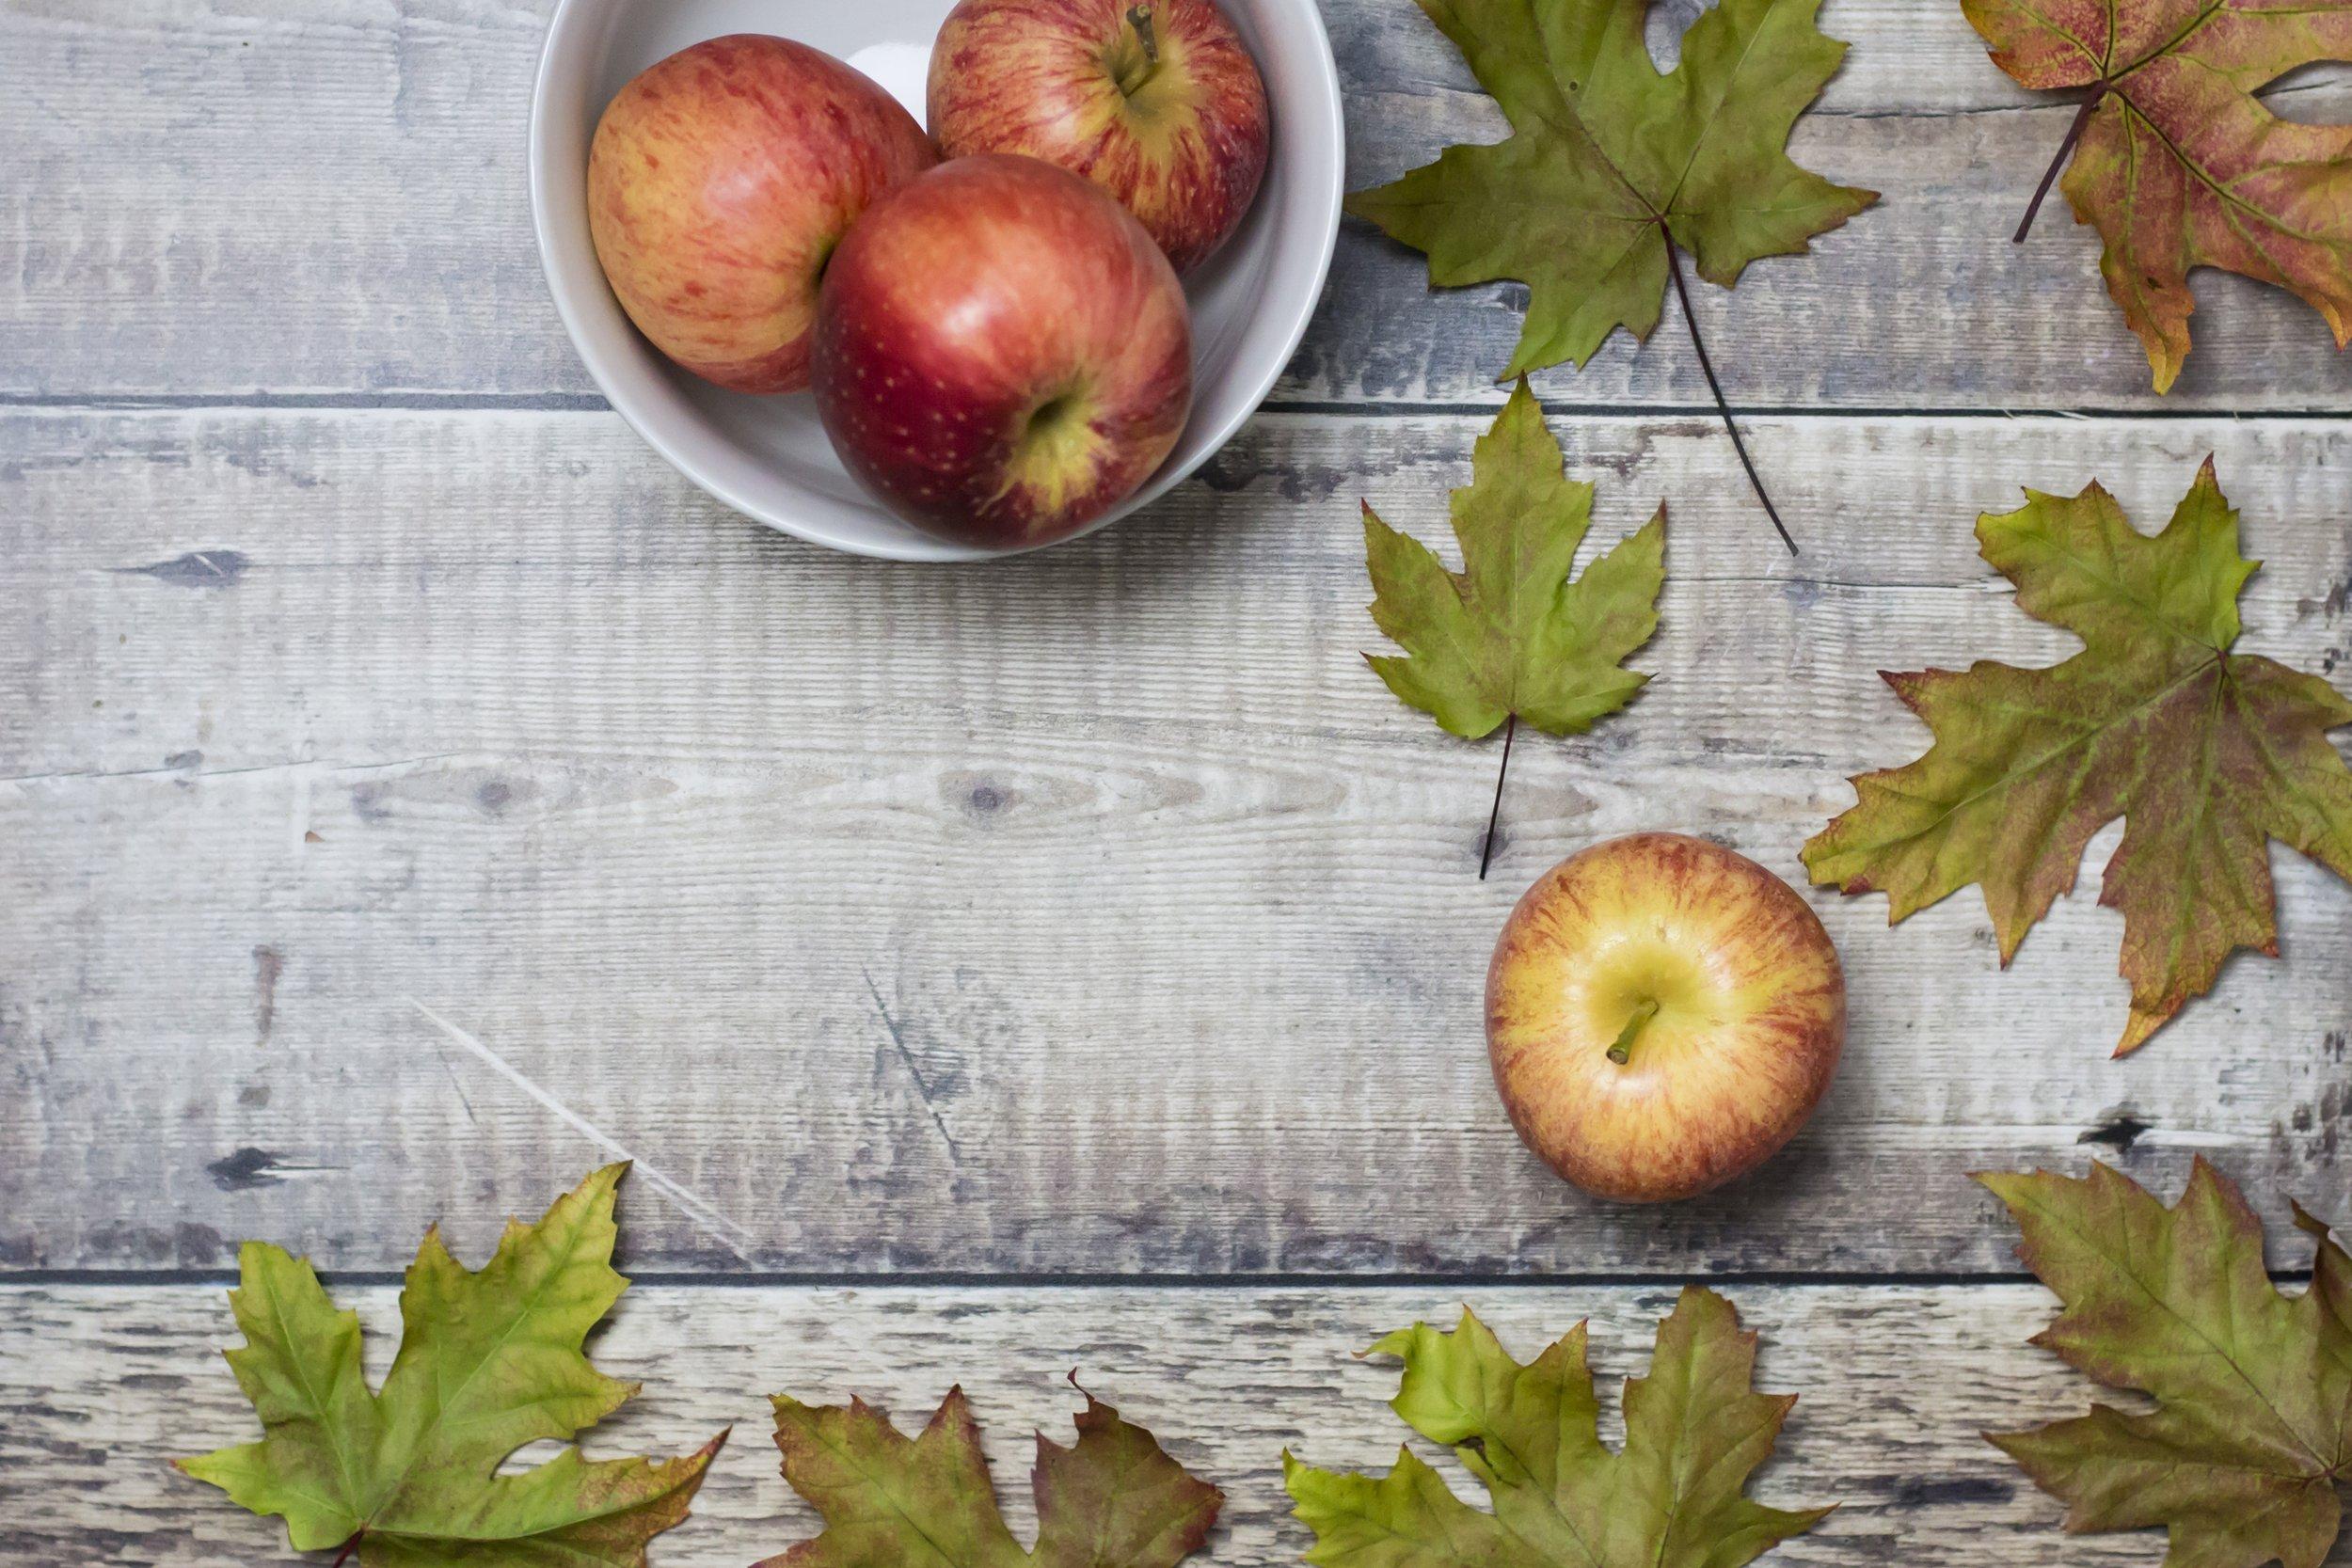 #thisuautumnlife October instagram hashtag project apple harvest rustic flatlay fall leaves